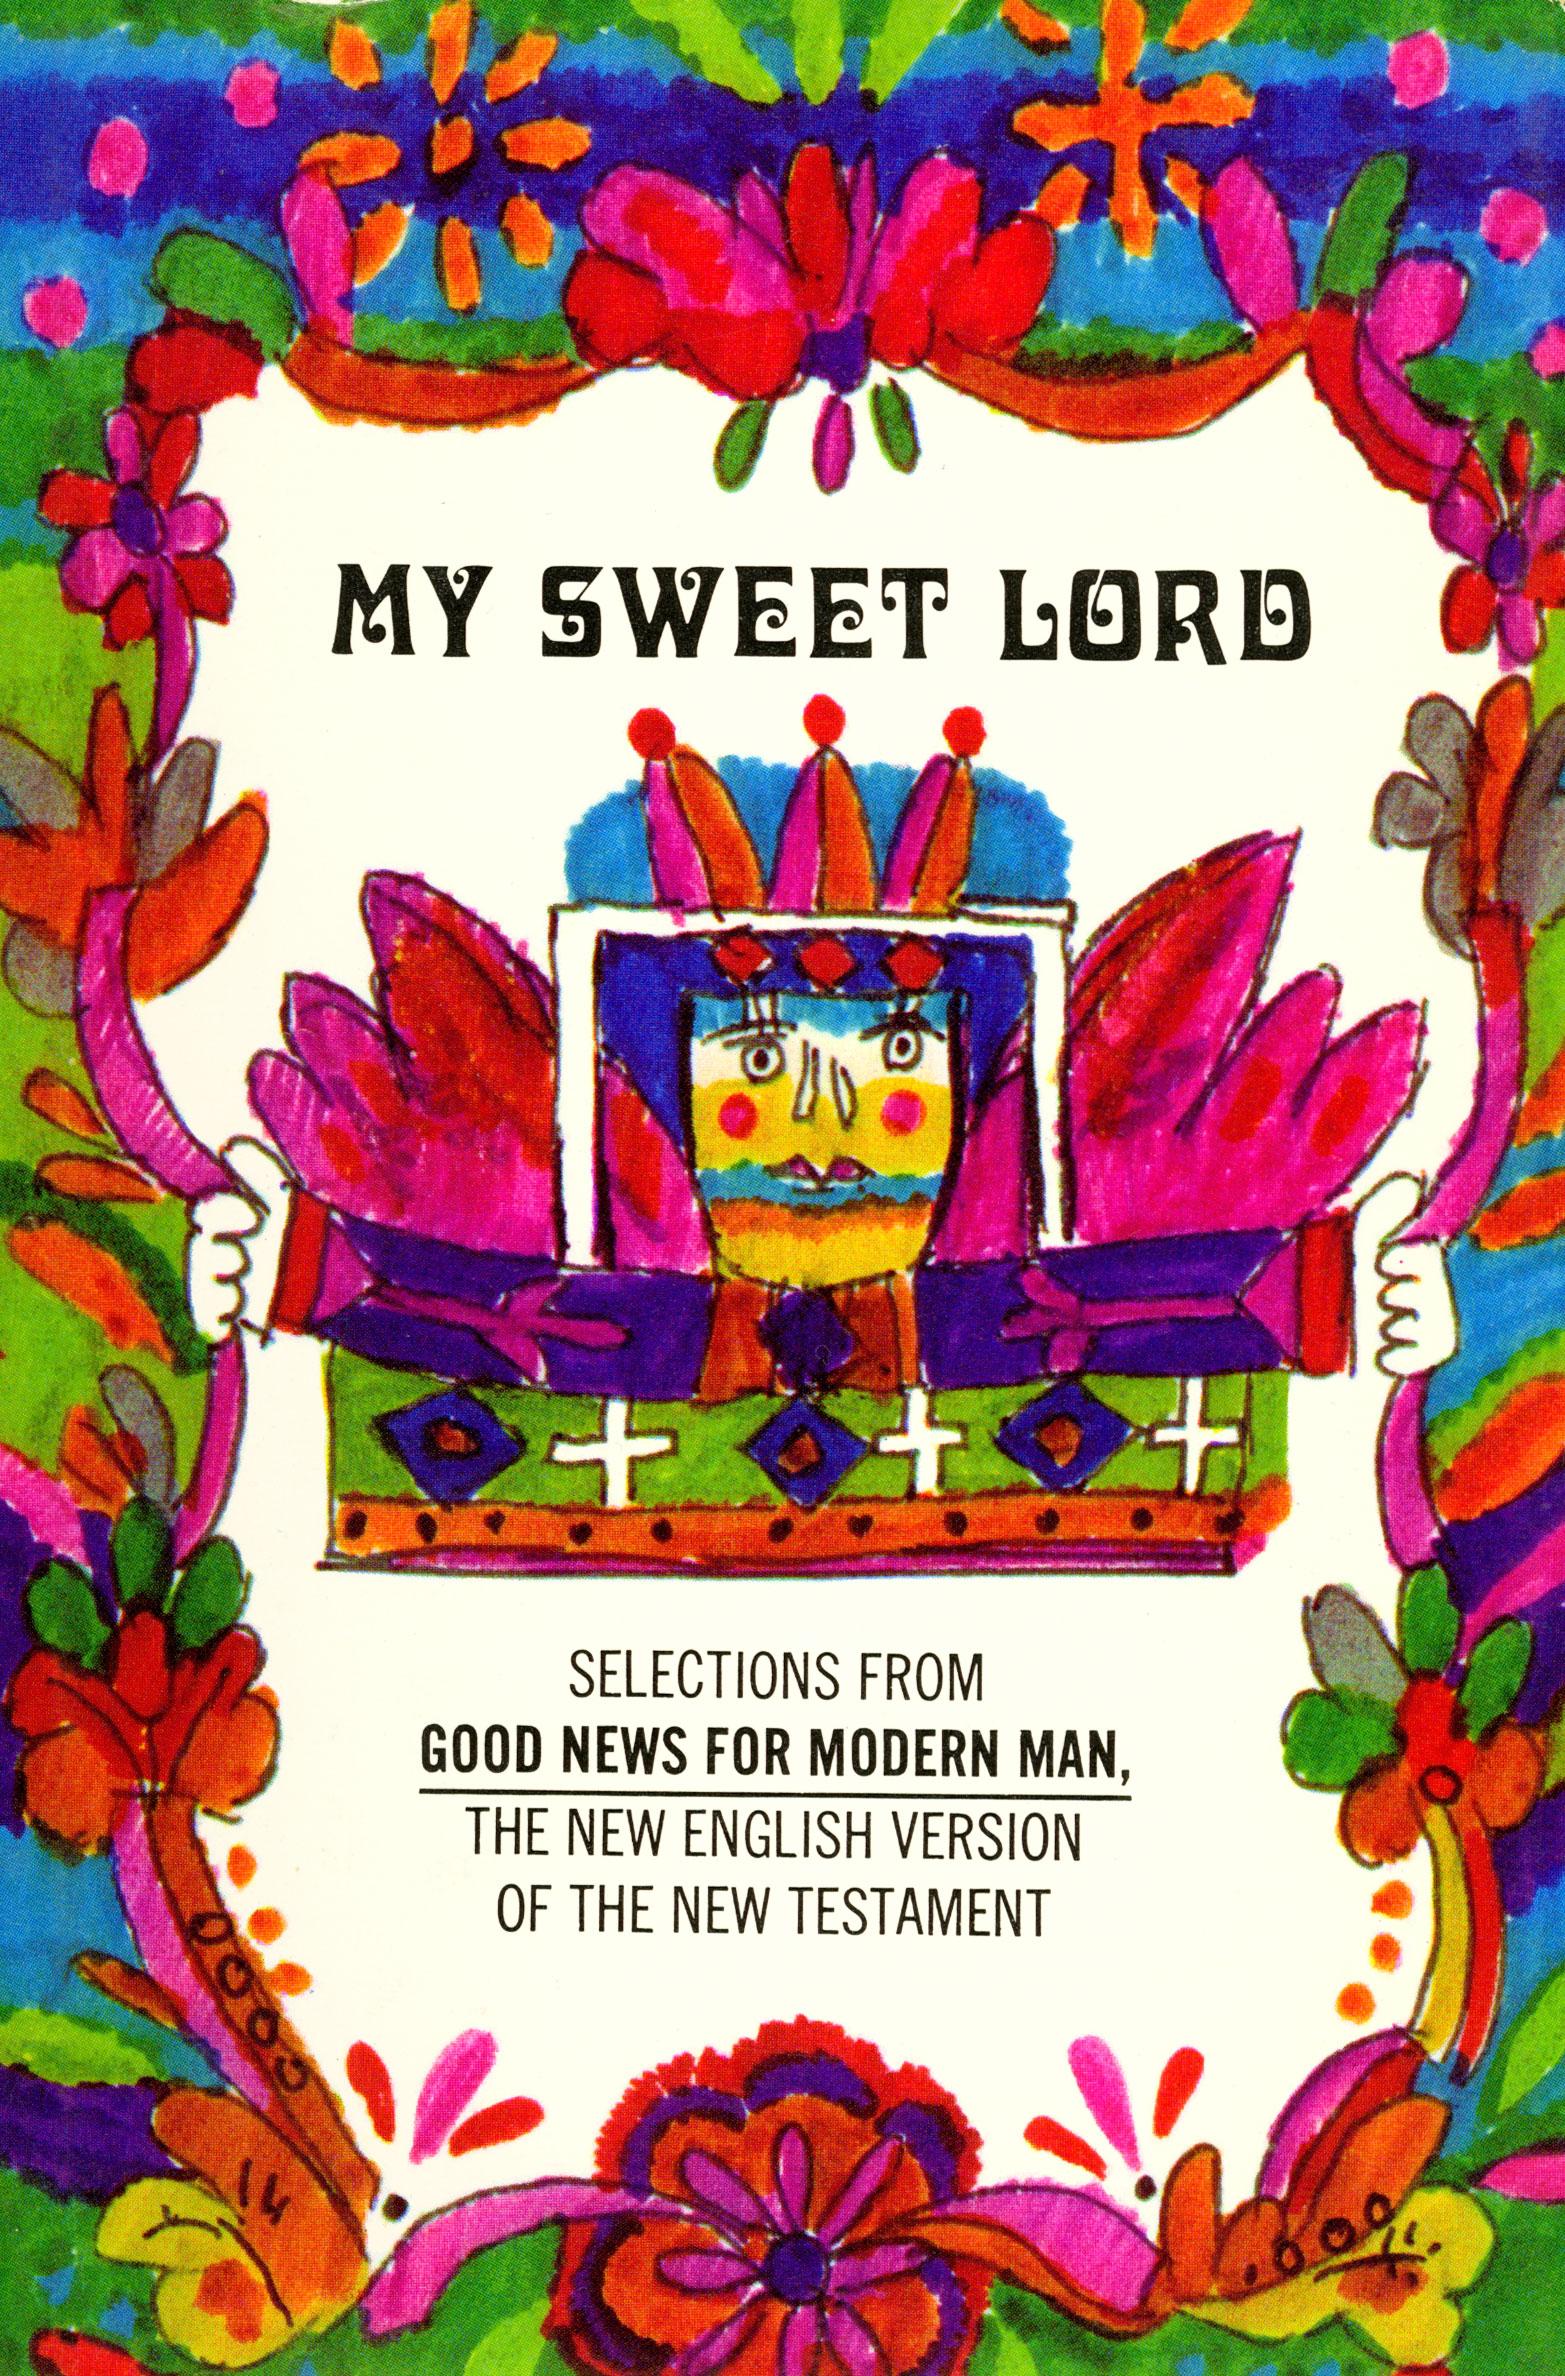 my-sweet-lord-c.jpg